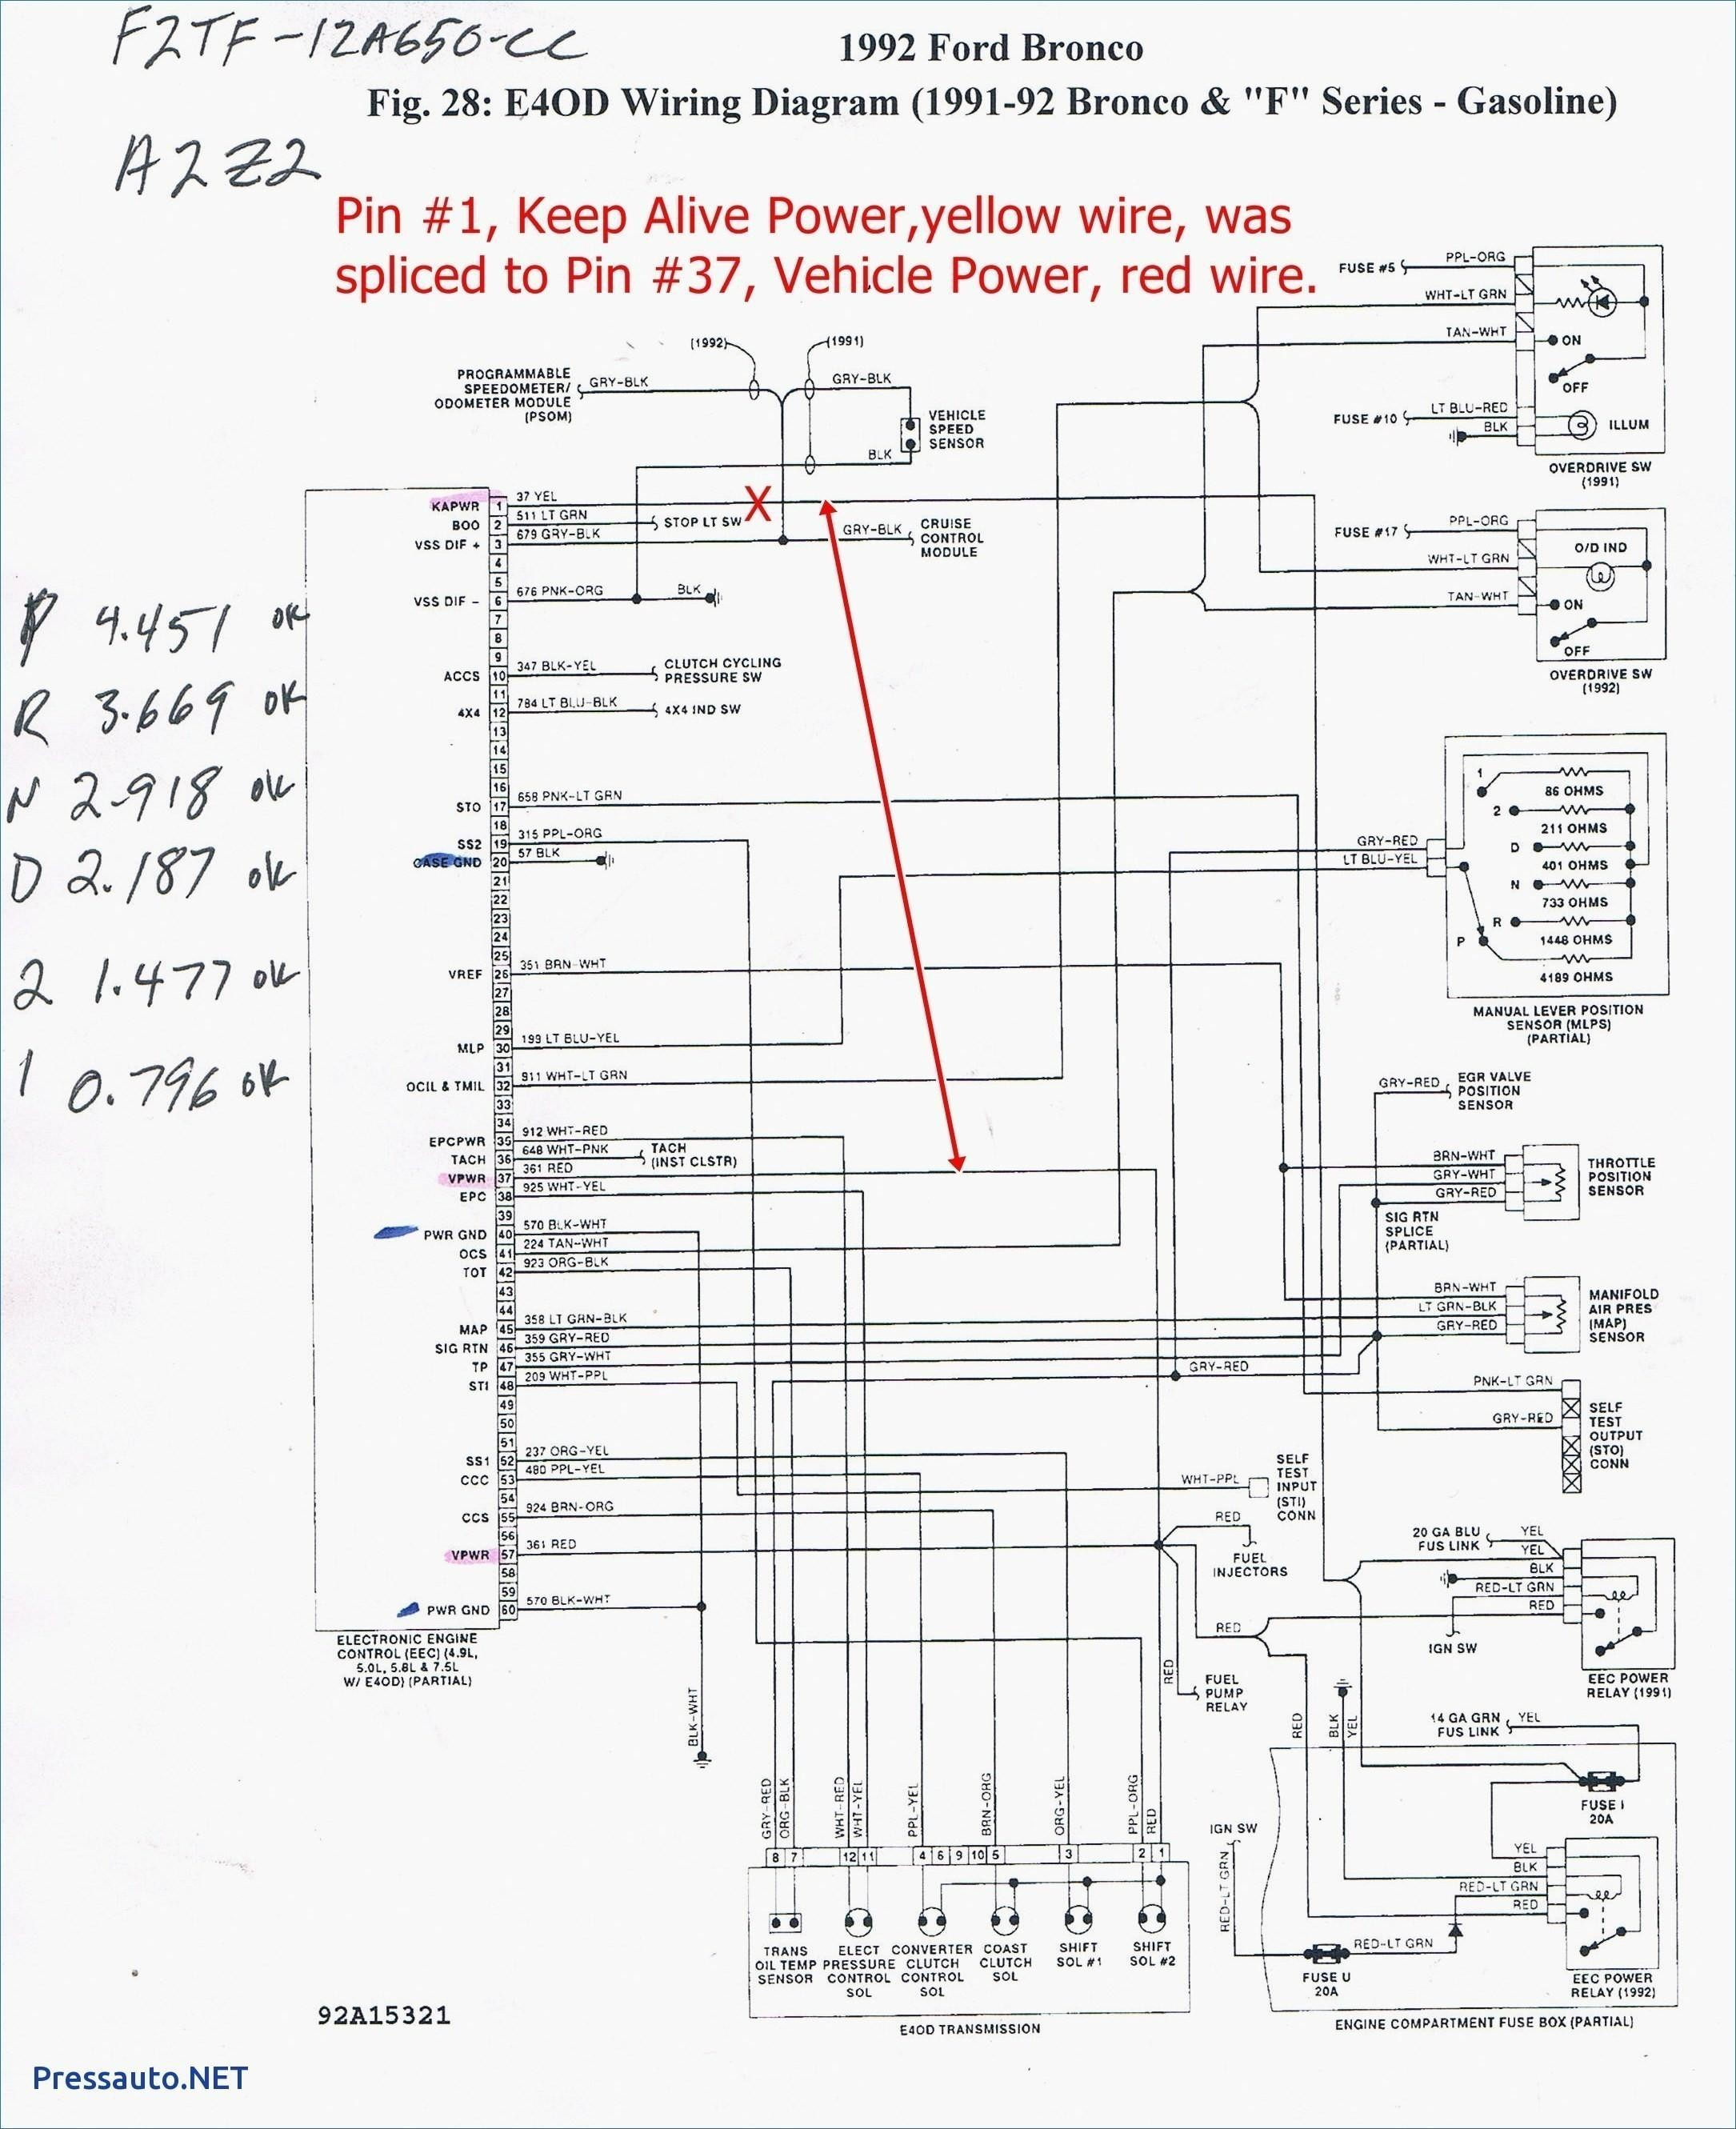 2002 Dodge Ram 1500 Wiring Diagram 1998 Dodge Ram 1500 Fuel Pump Unique 2002 Dodge Ram 1500 Fuel Pump Of 2002 Dodge Ram 1500 Wiring Diagram